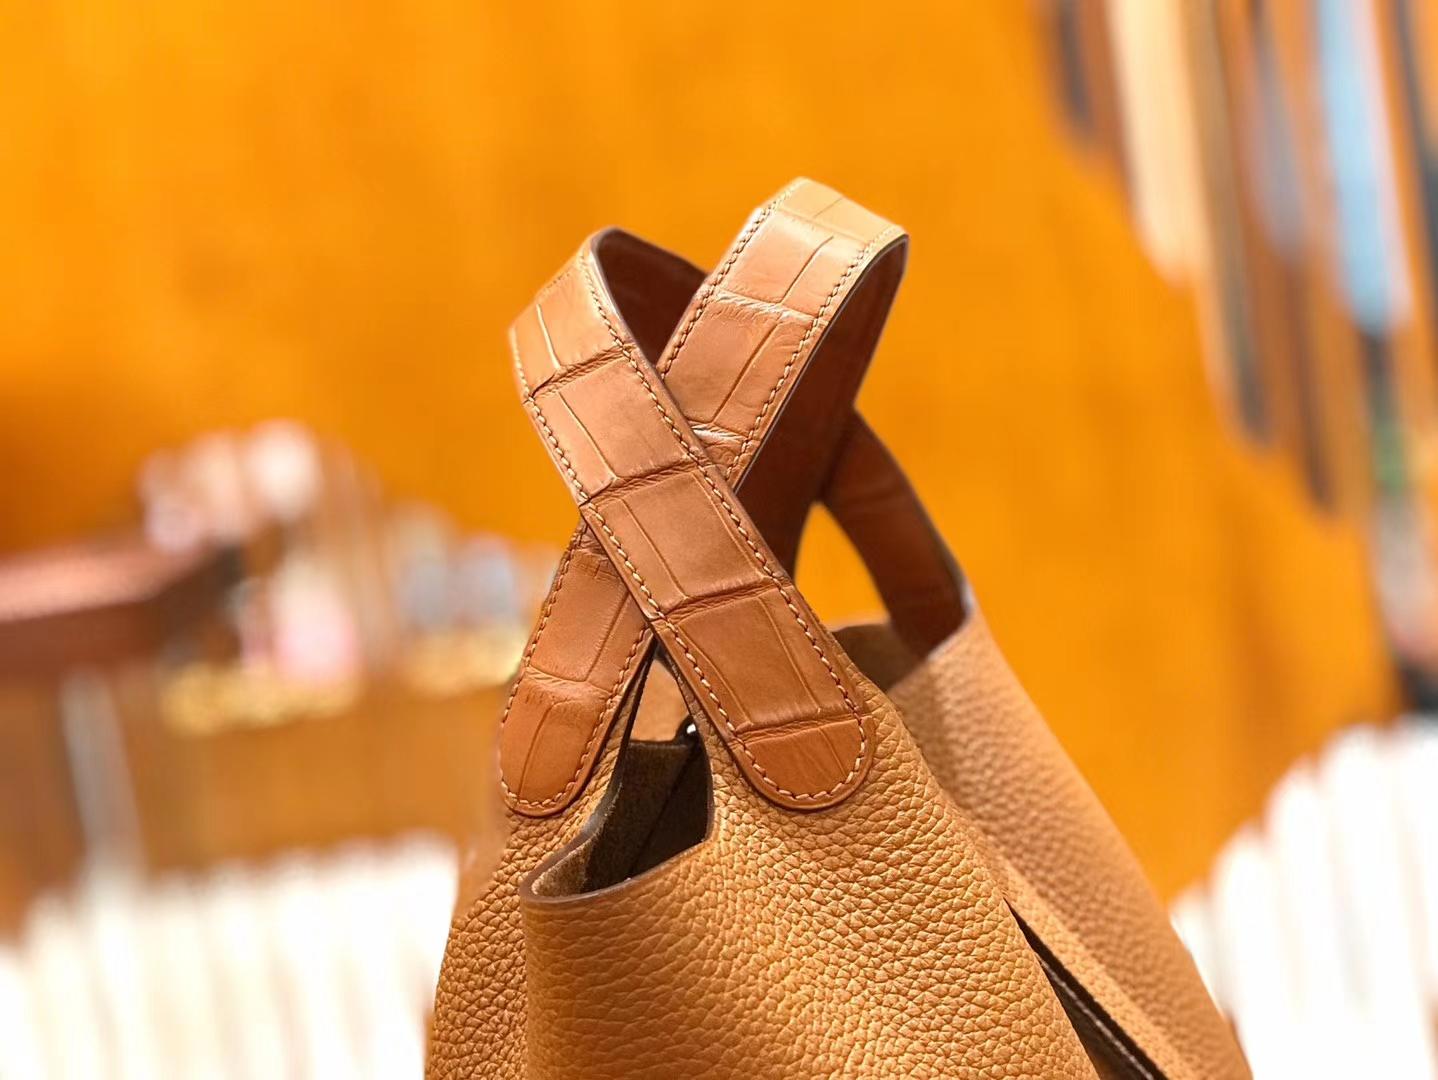 Hermès(爱马仕)Piction 18cm 焦糖棕 银扣 鳄鱼皮拼小牛皮 全手工缝制